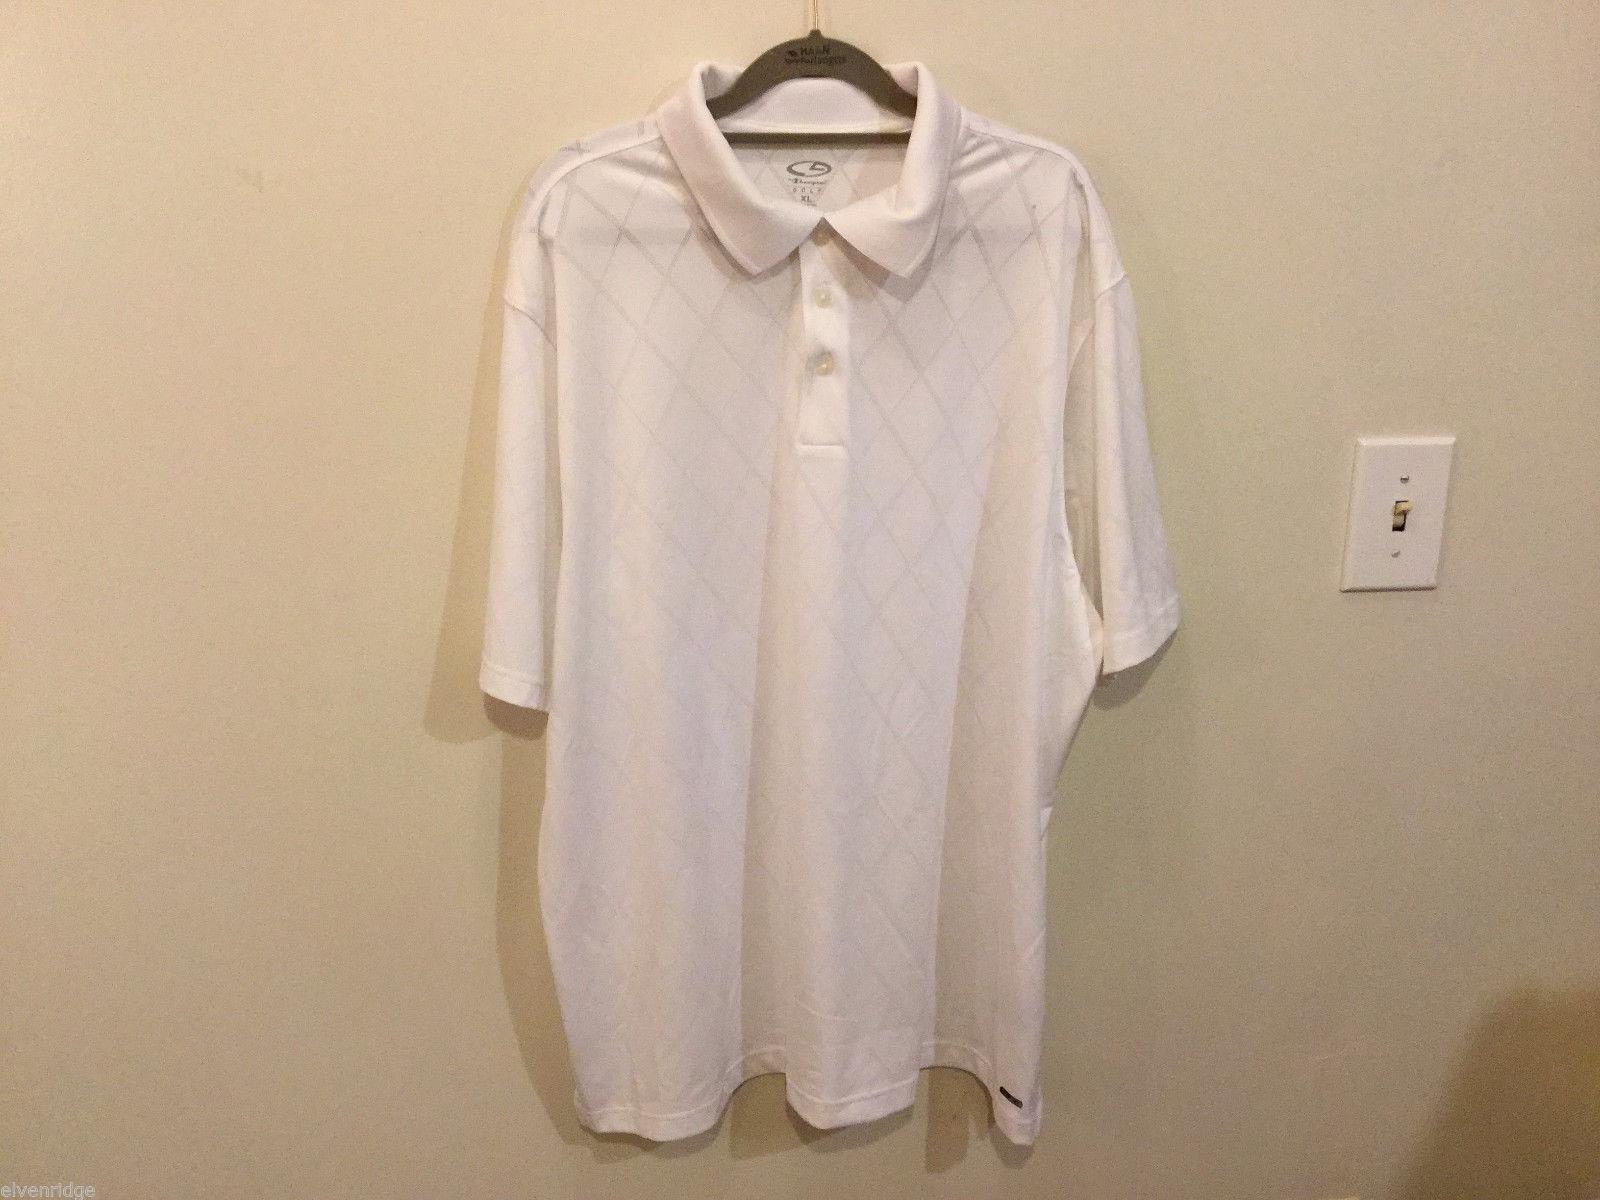 Champion Golf Mens White with Light Gray Diamond pattern Casual Shirt, Size XL